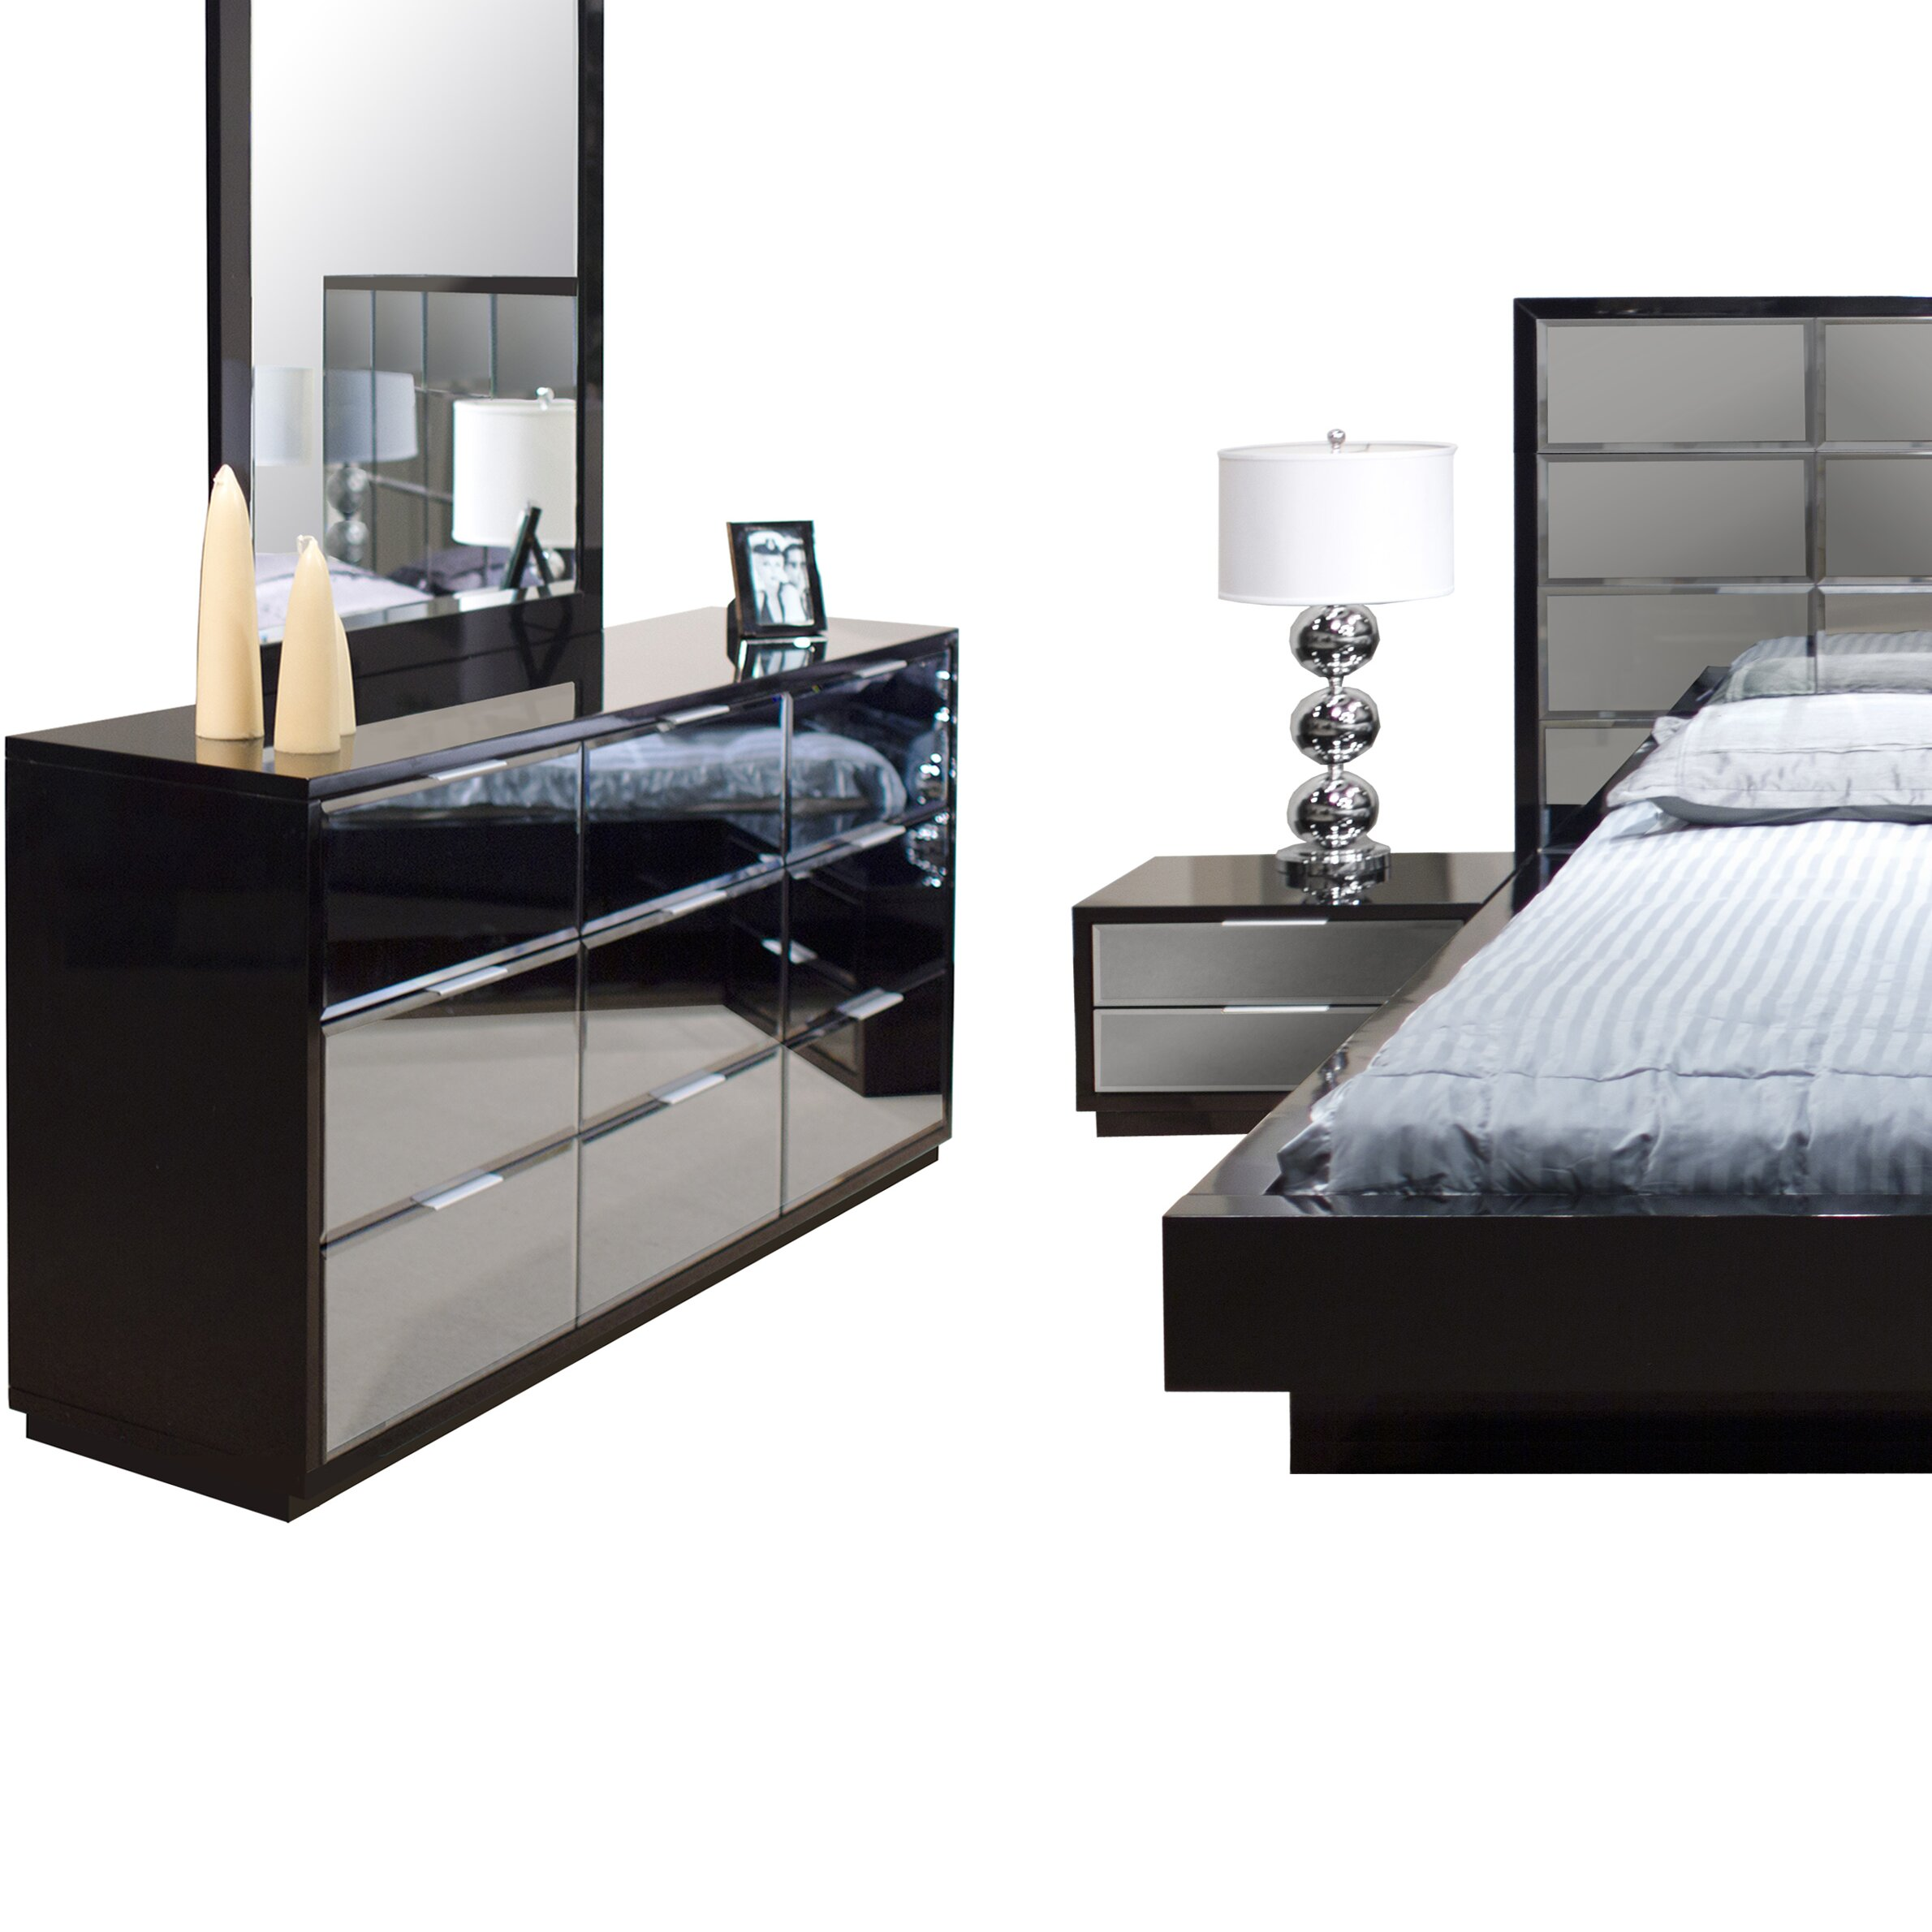 sharelle furniture - sharelle furniture